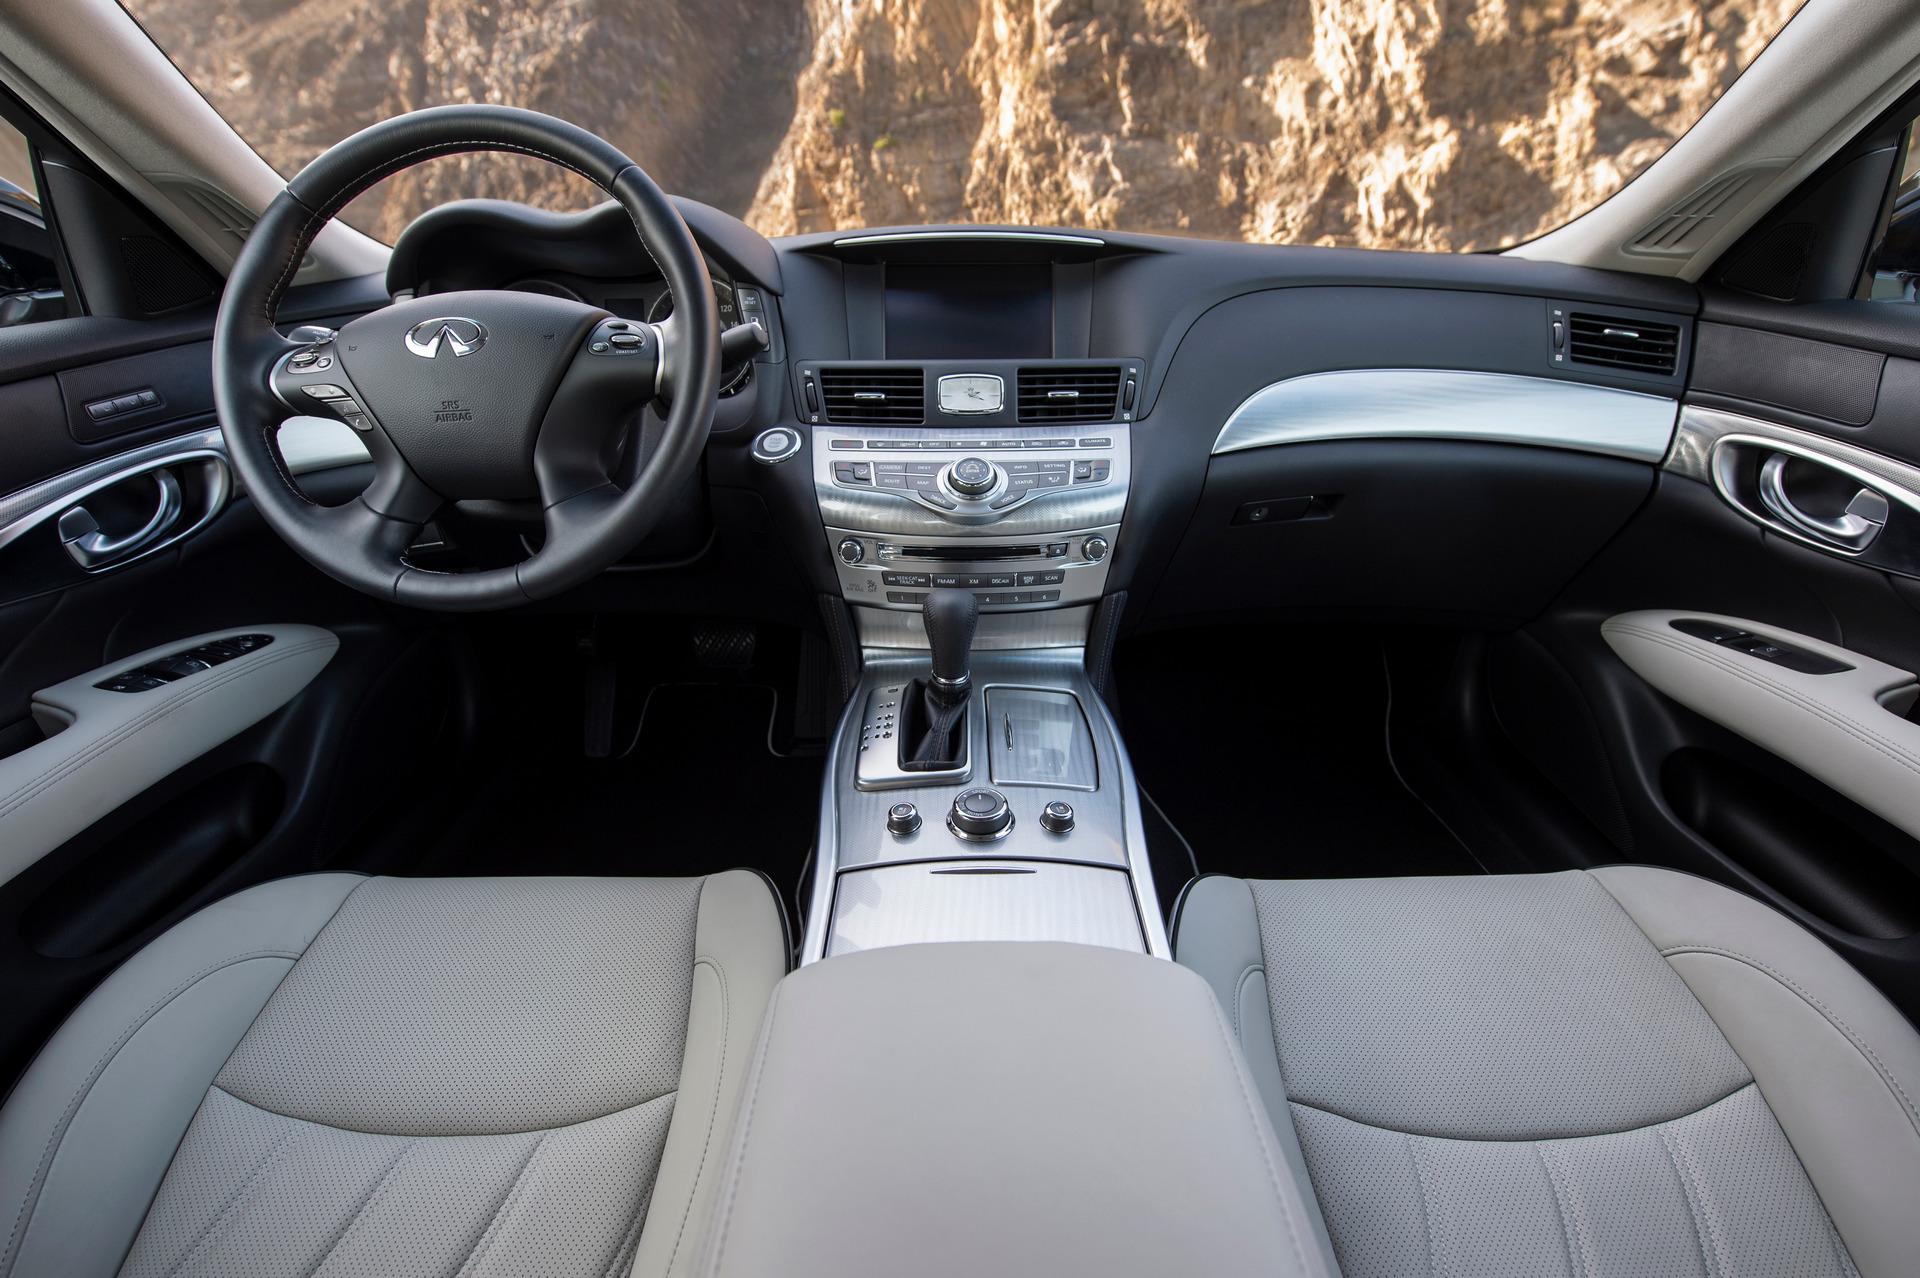 2016 Infiniti Q70 Premium Select Edition © Nissan Motor Co., Ltd.